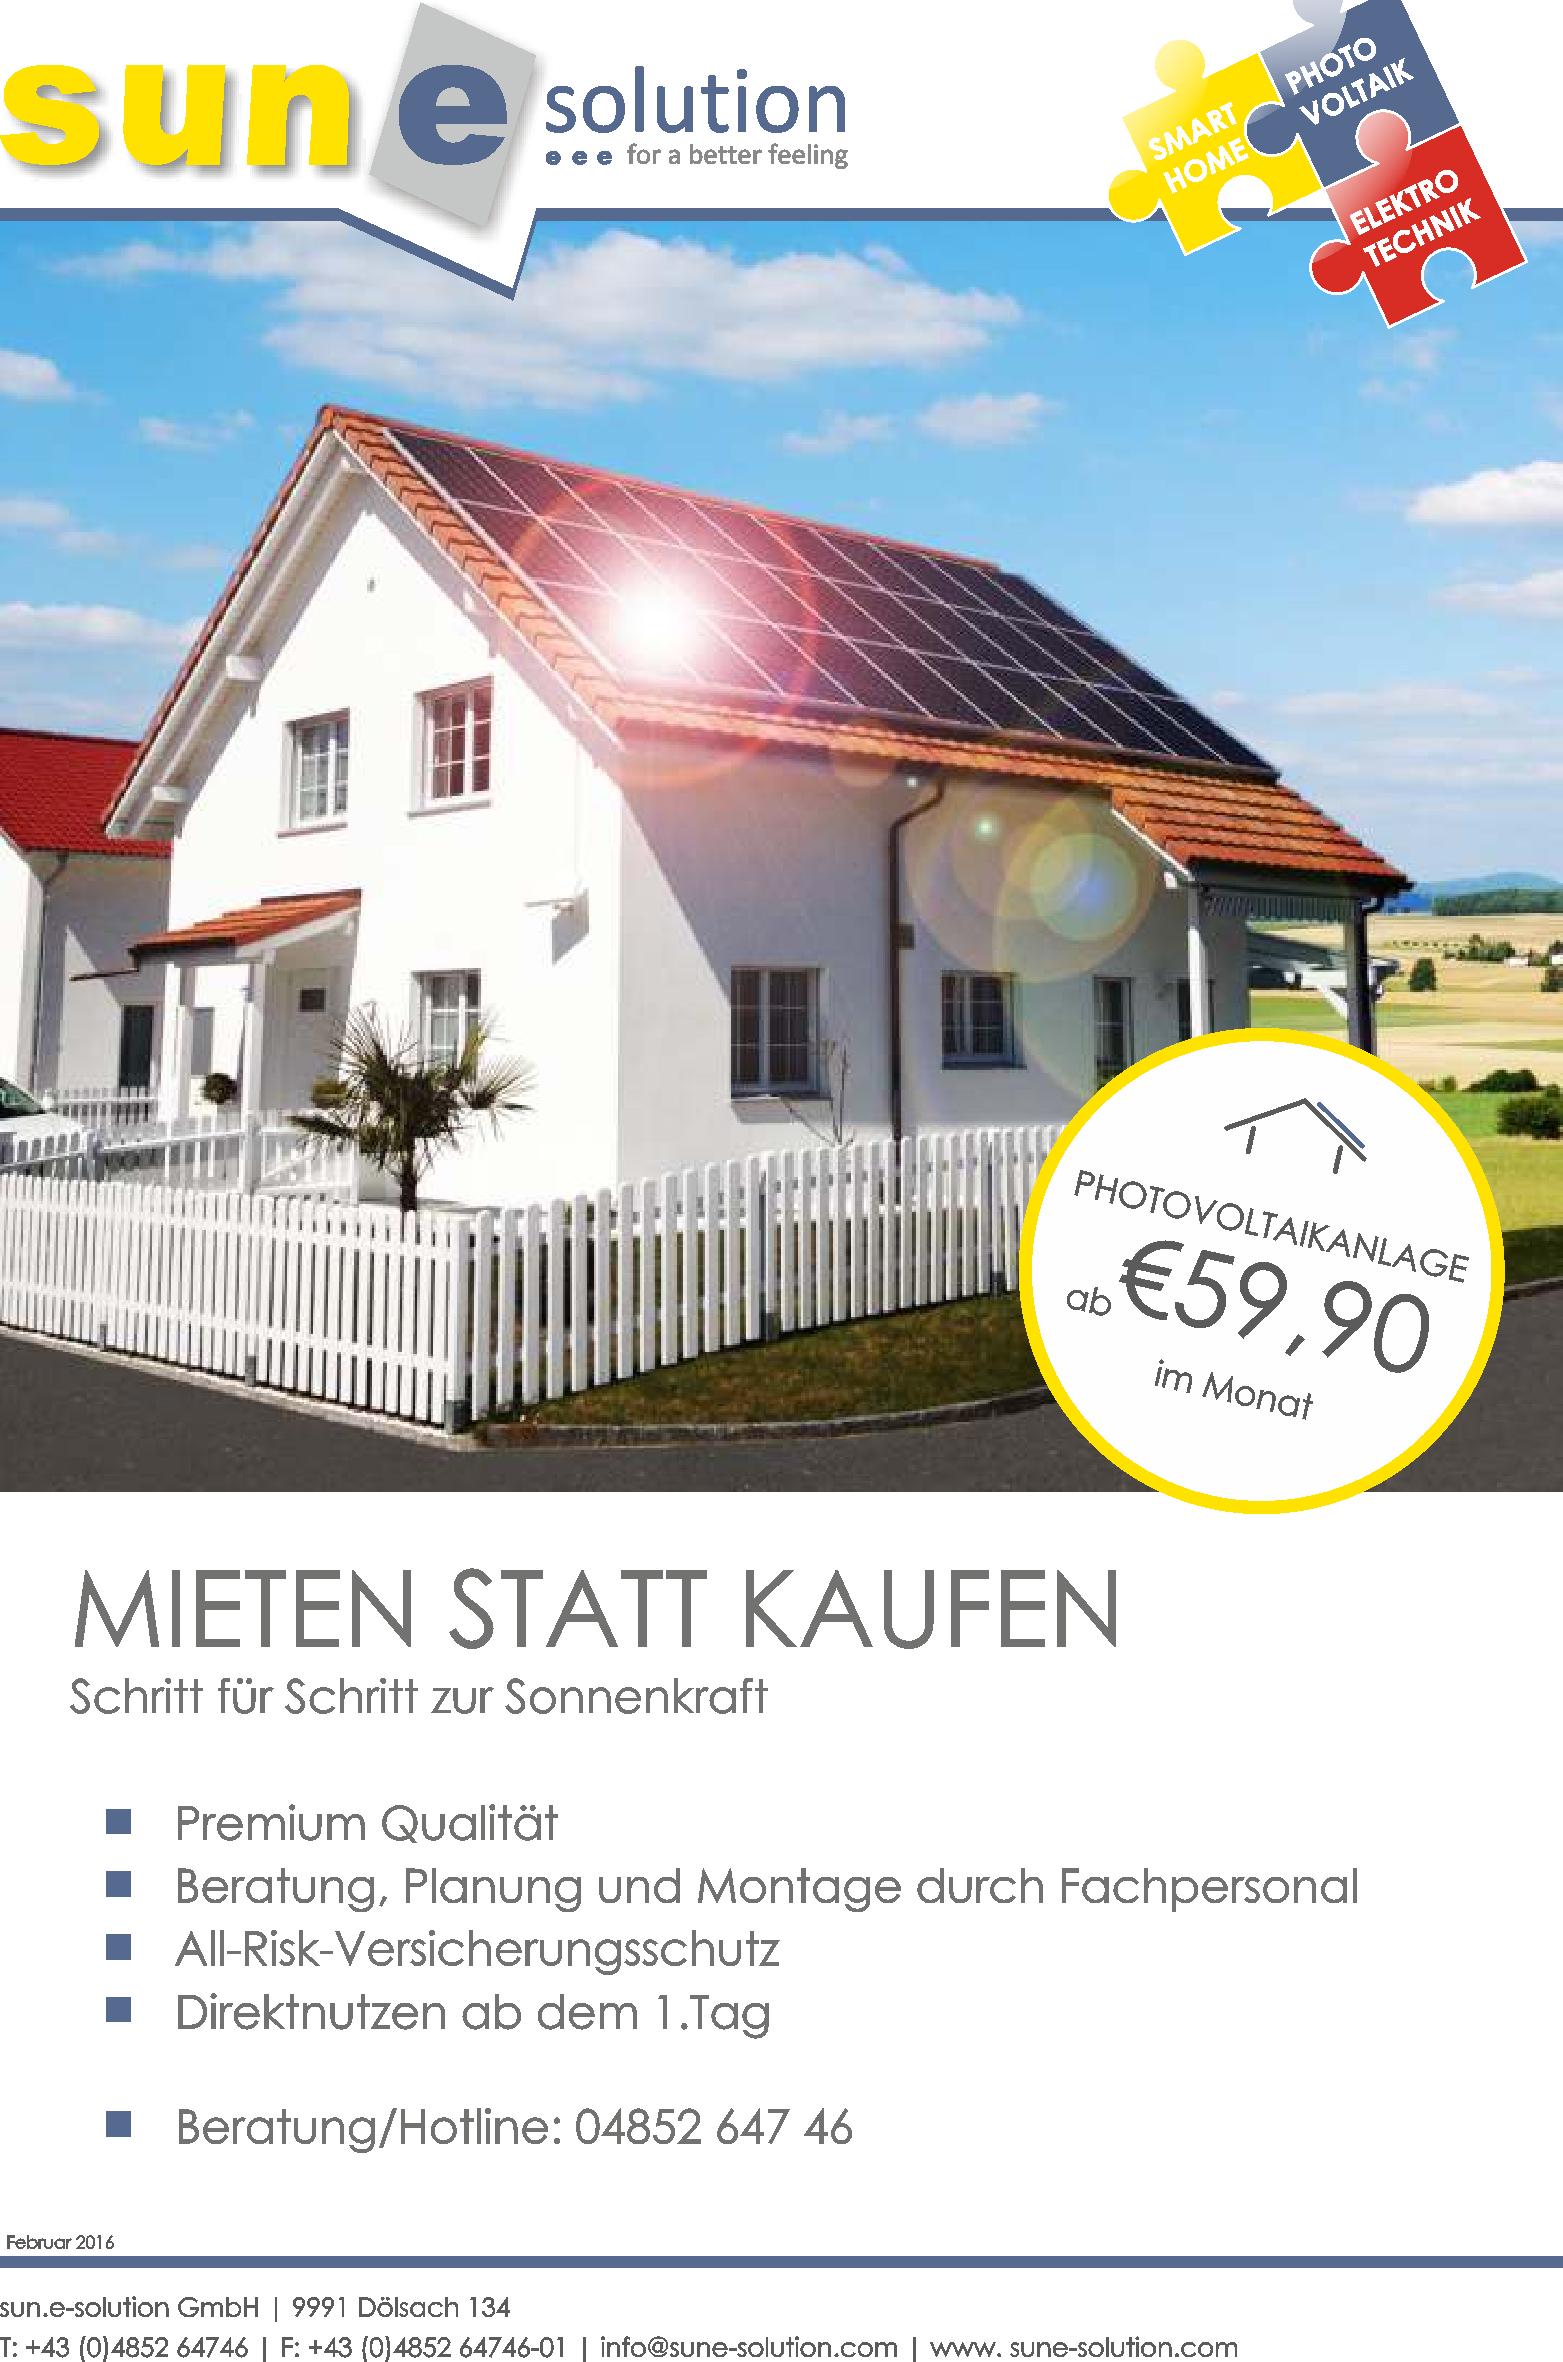 Quelle: sun.e-solution GmbH